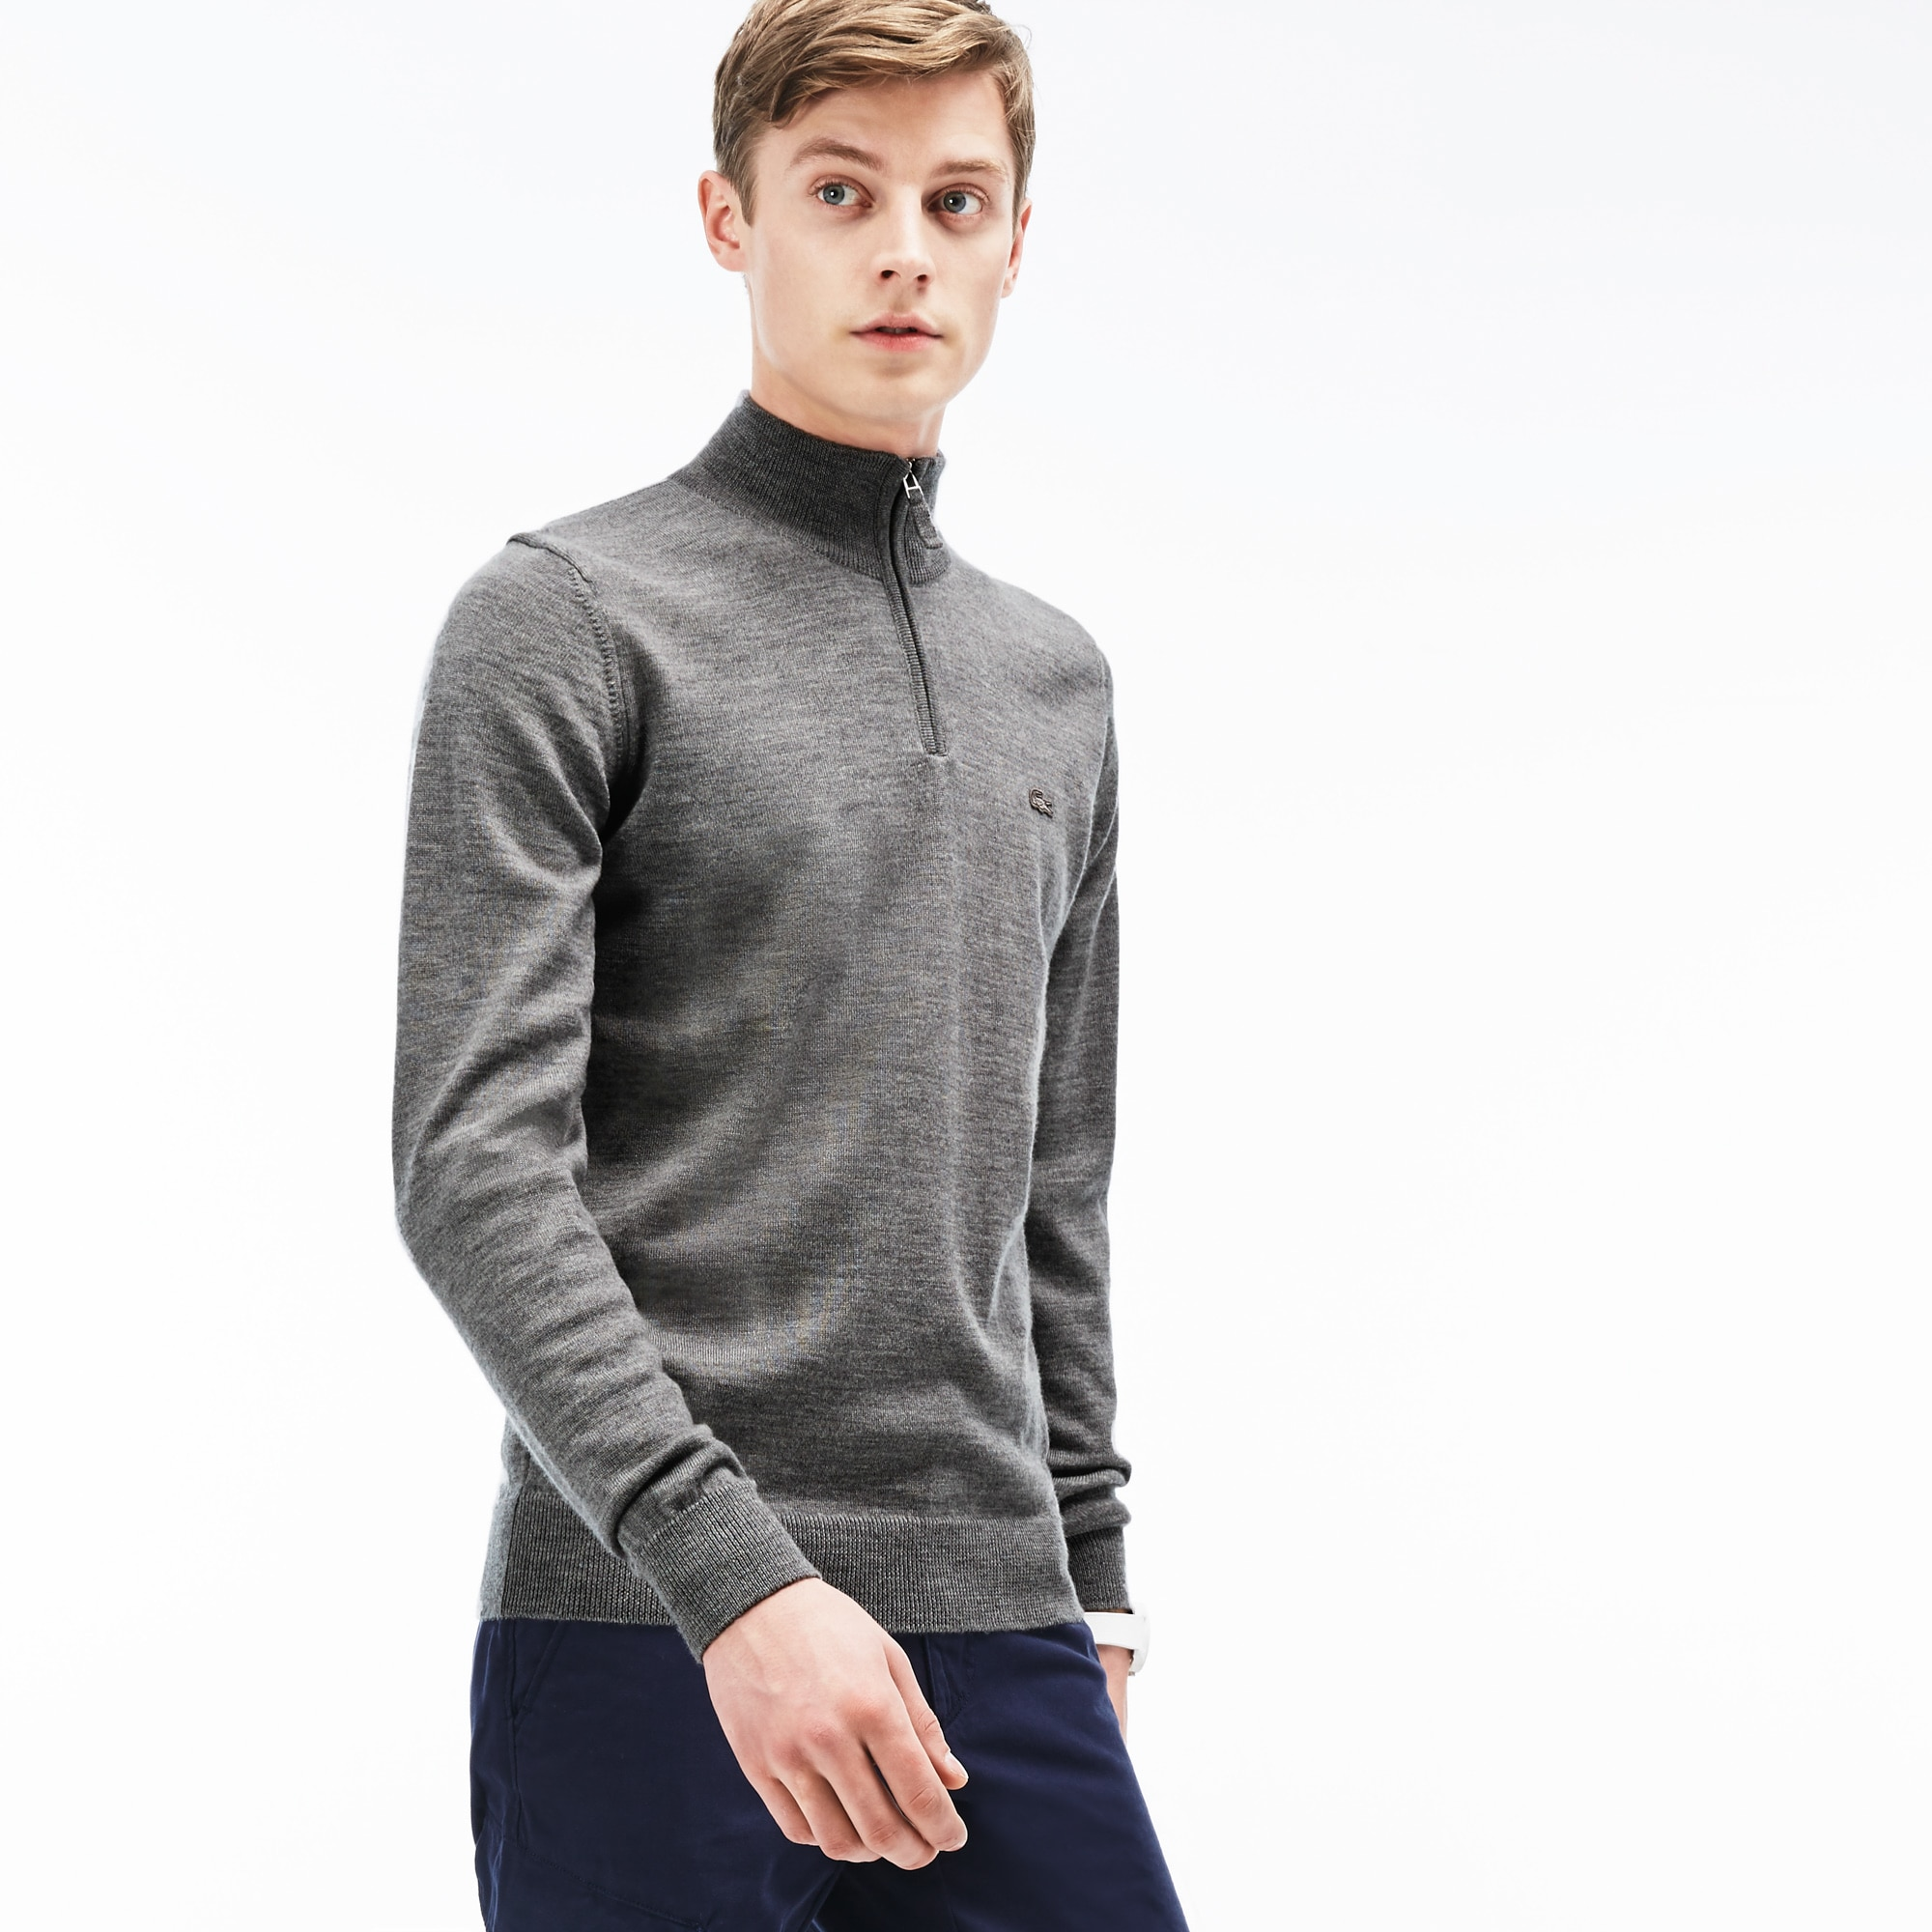 Men's Zippered Stand-Up Collar Wool Jersey Sweater